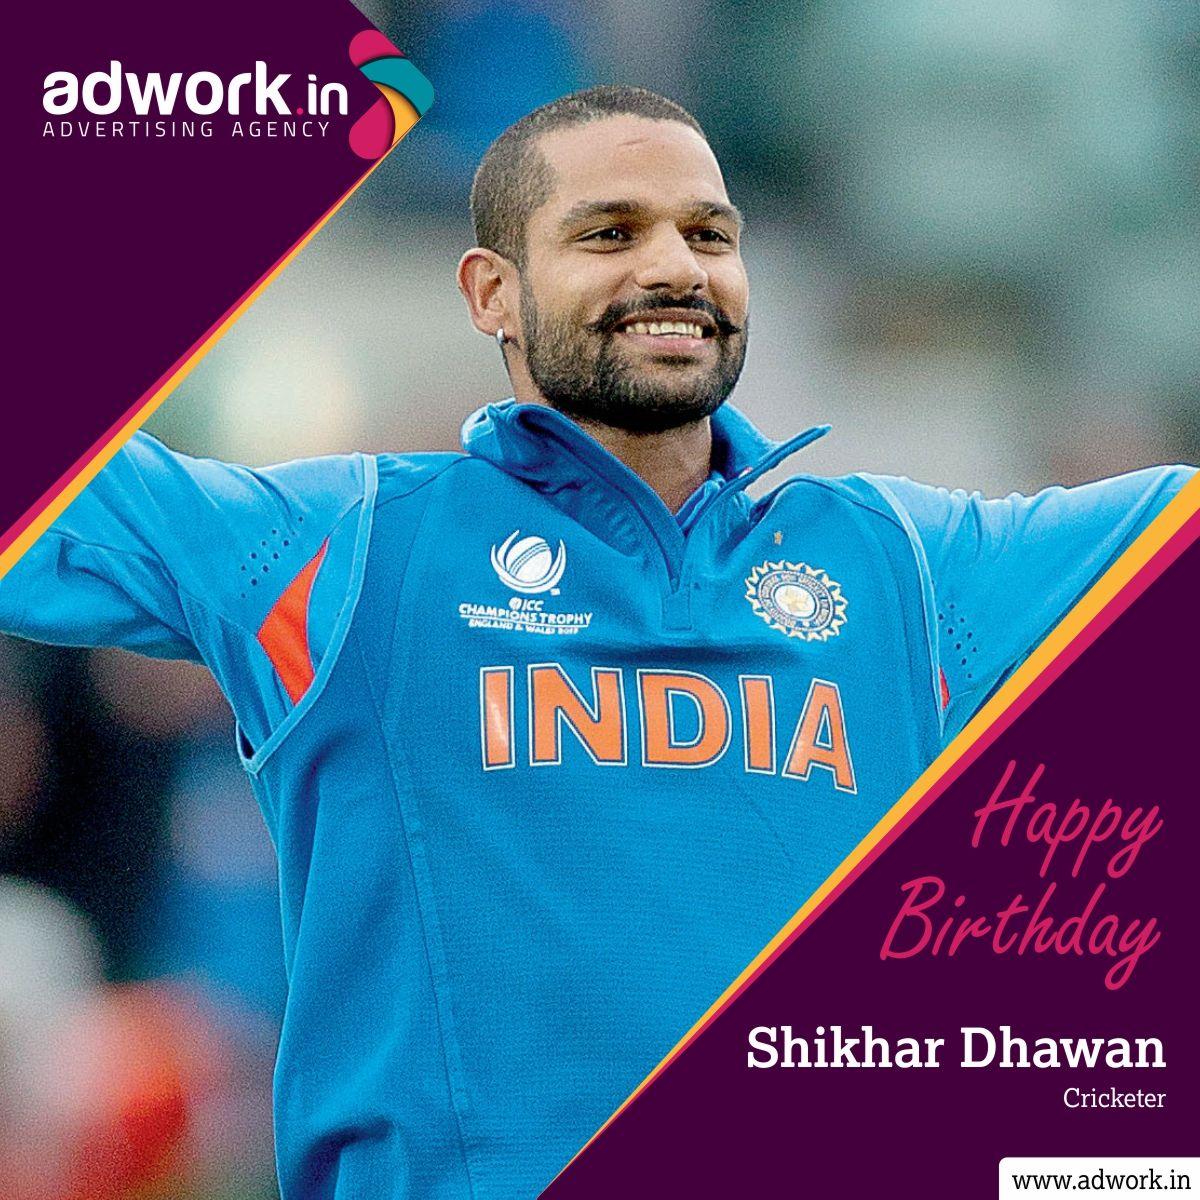 Wish you HappyBirthday ShikharDhawan (Cricketer), Visit